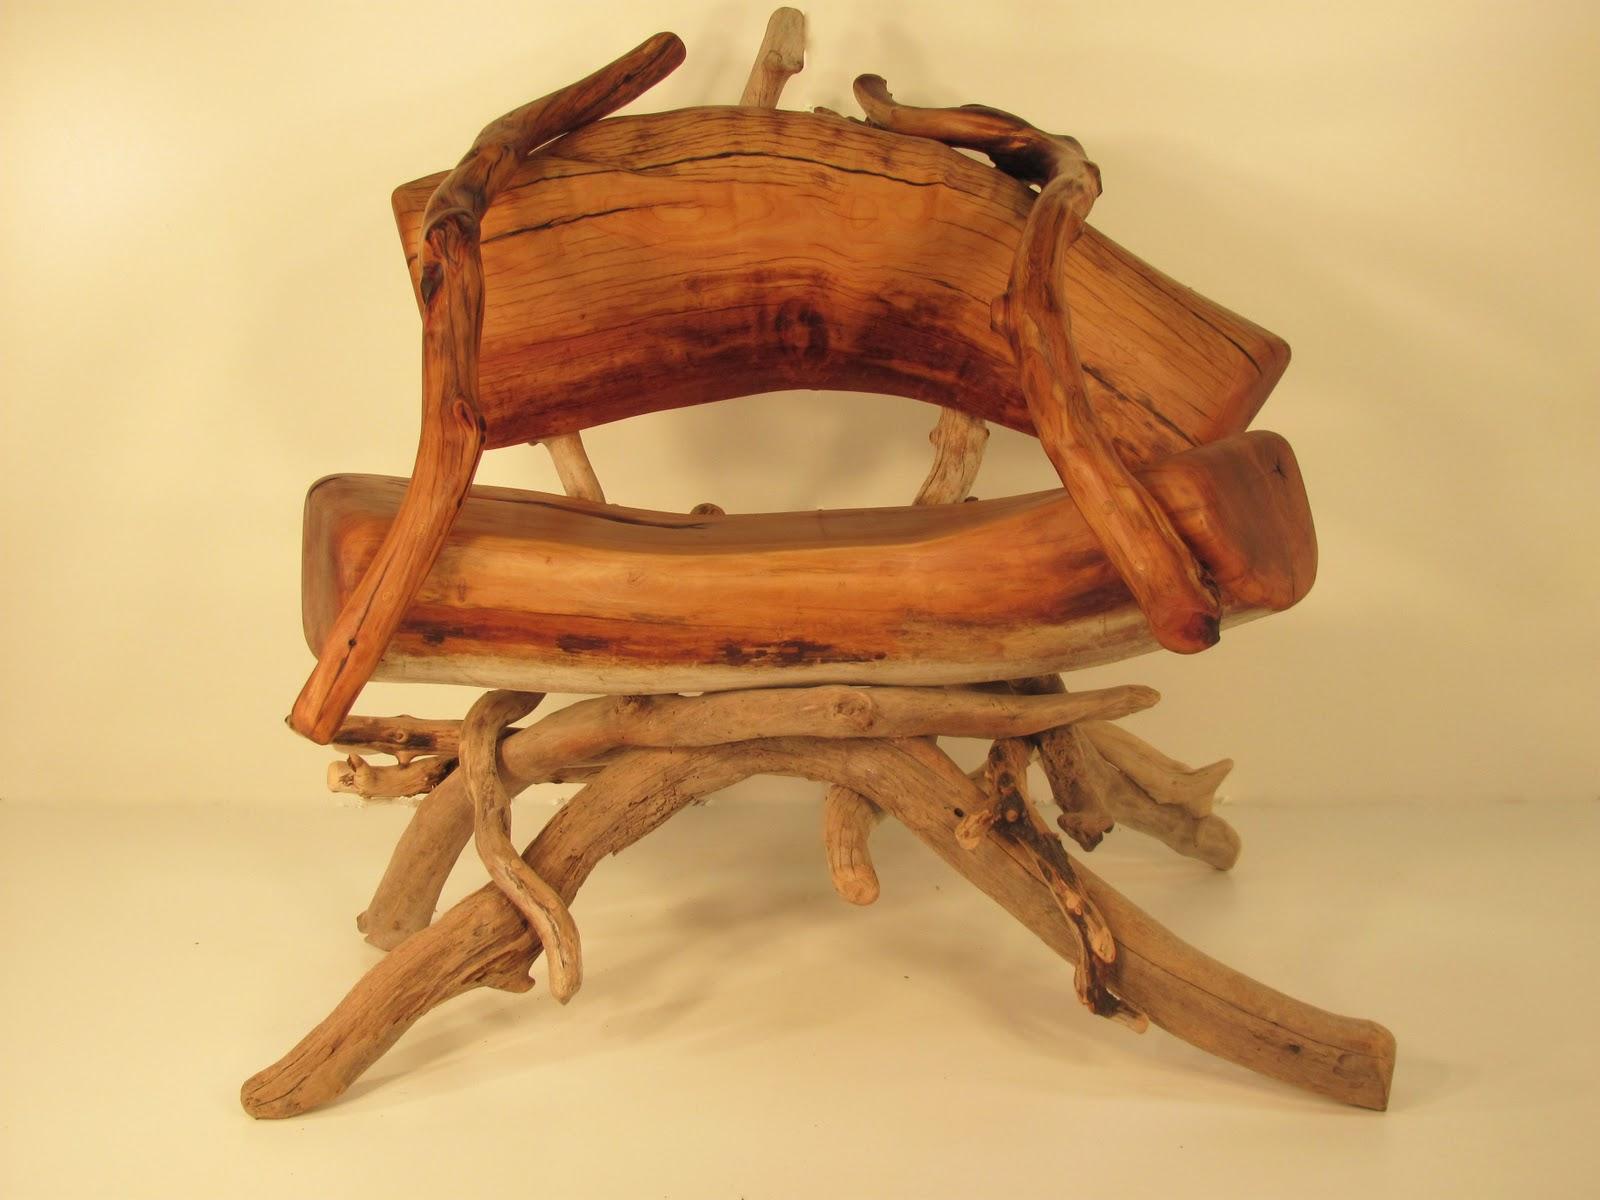 Modern Urban Organic Furniture